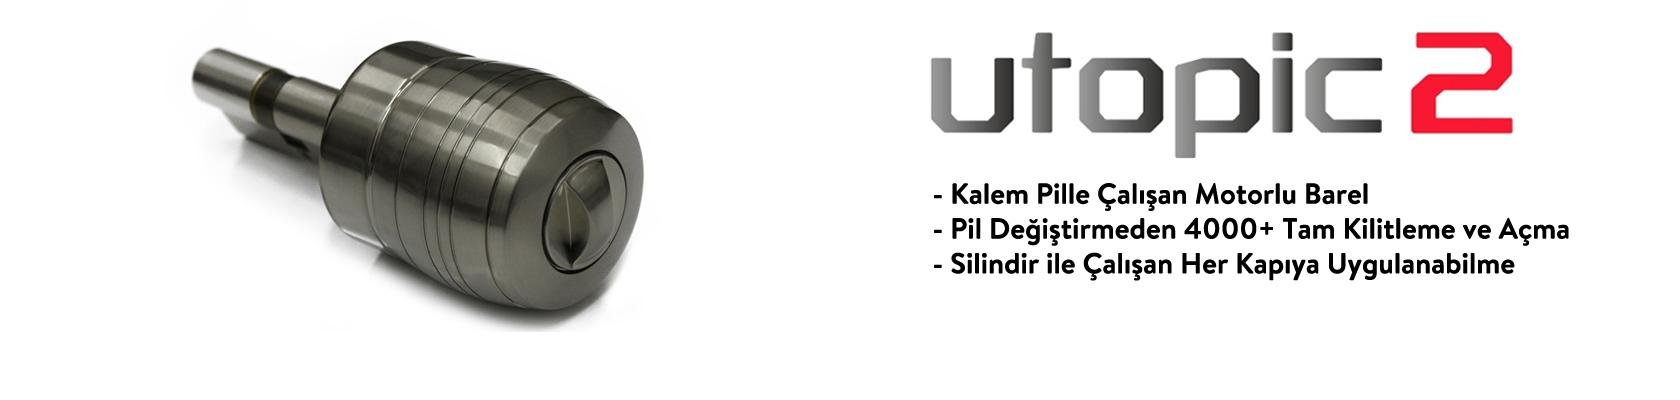 DESİ Utopic 2